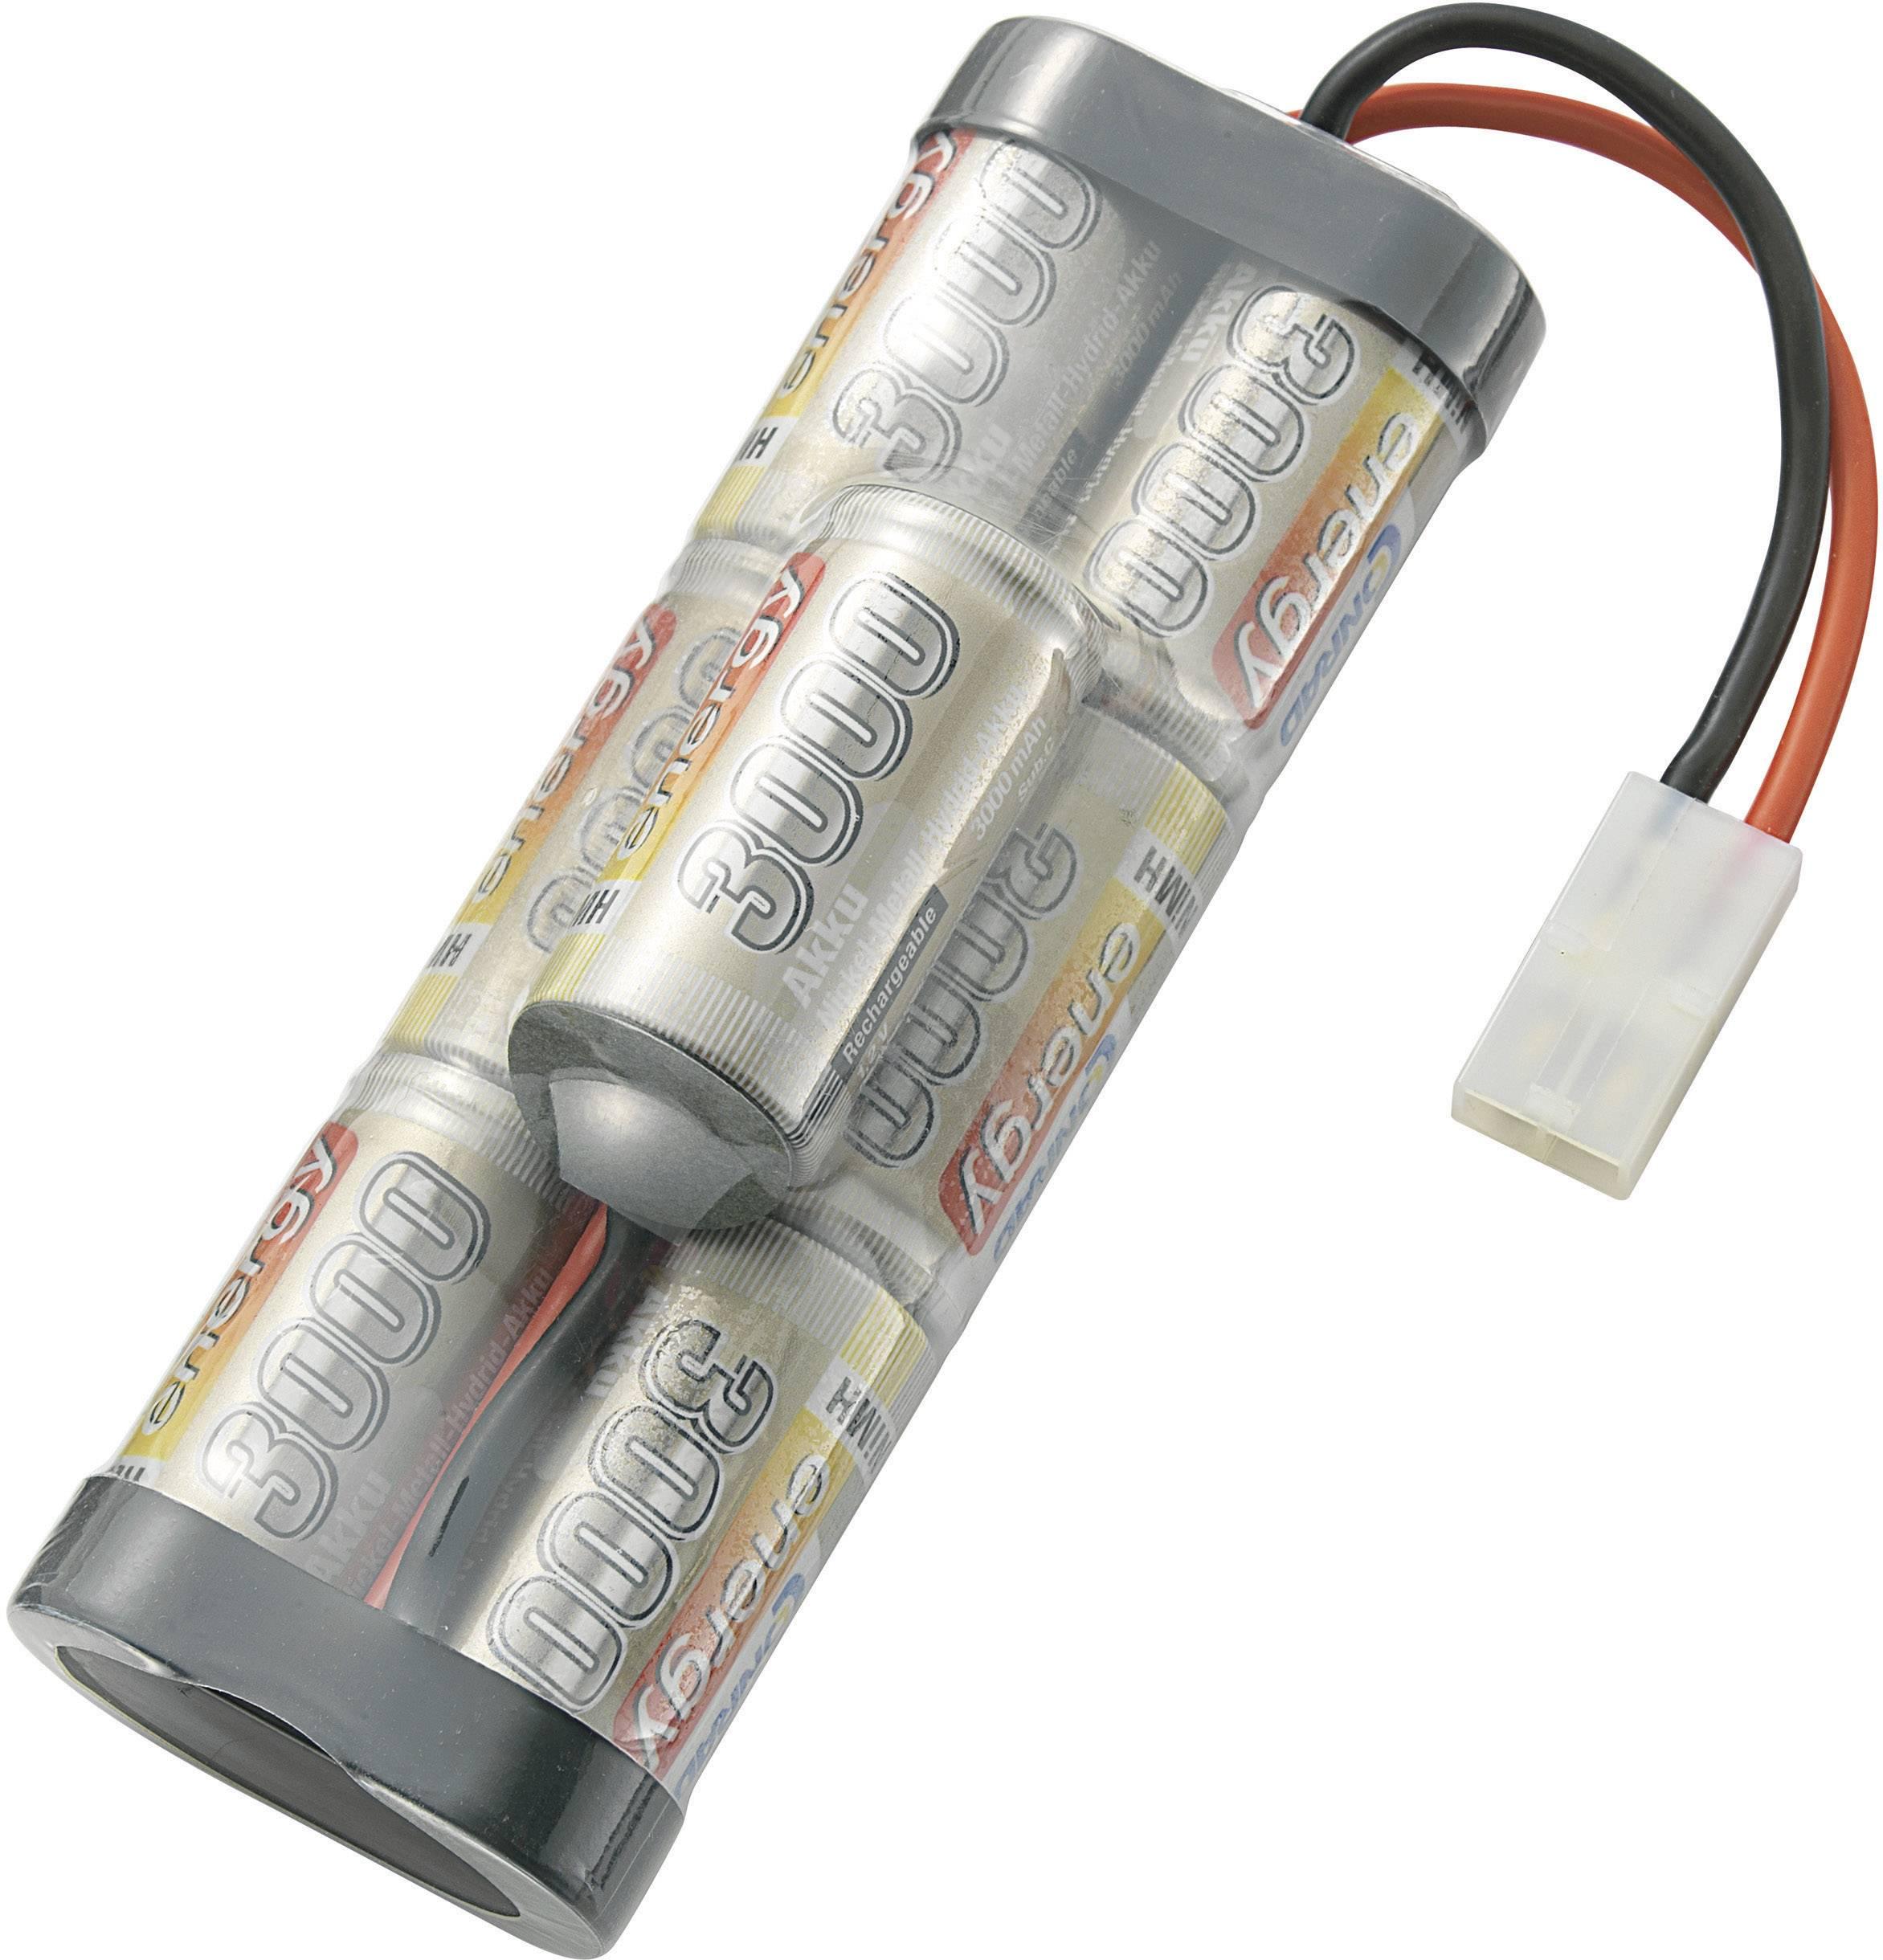 Akupack NiMH Conrad energy SC1.2/*7 3000MAH, 8.4 V, 3000 mAh